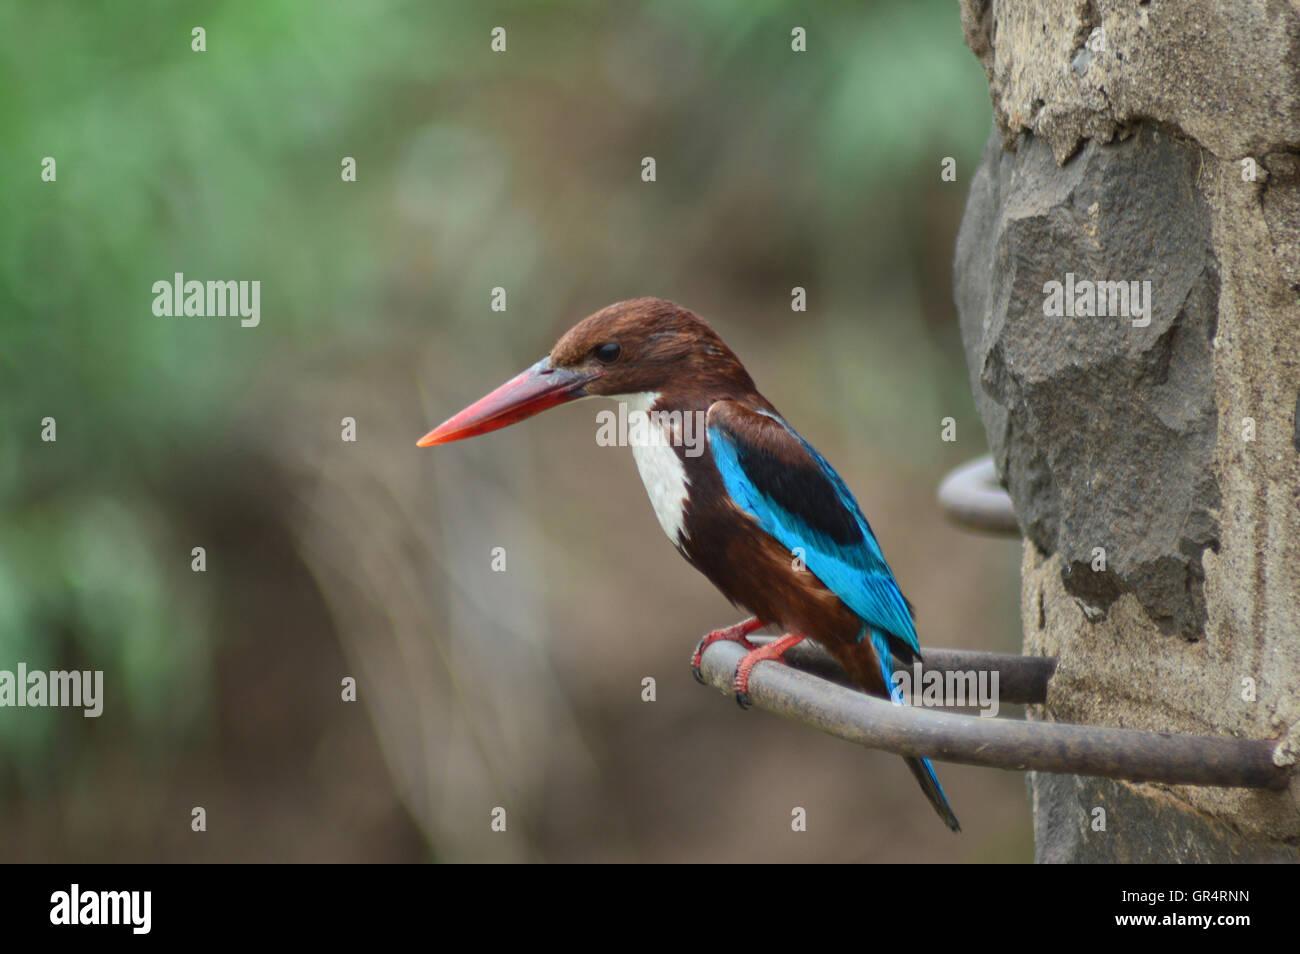 The White-throated Kingfisher, Halcyon smyrnensis also known as the White-breasted Kingfisher or Smyrna Kingfisher, - Stock Image